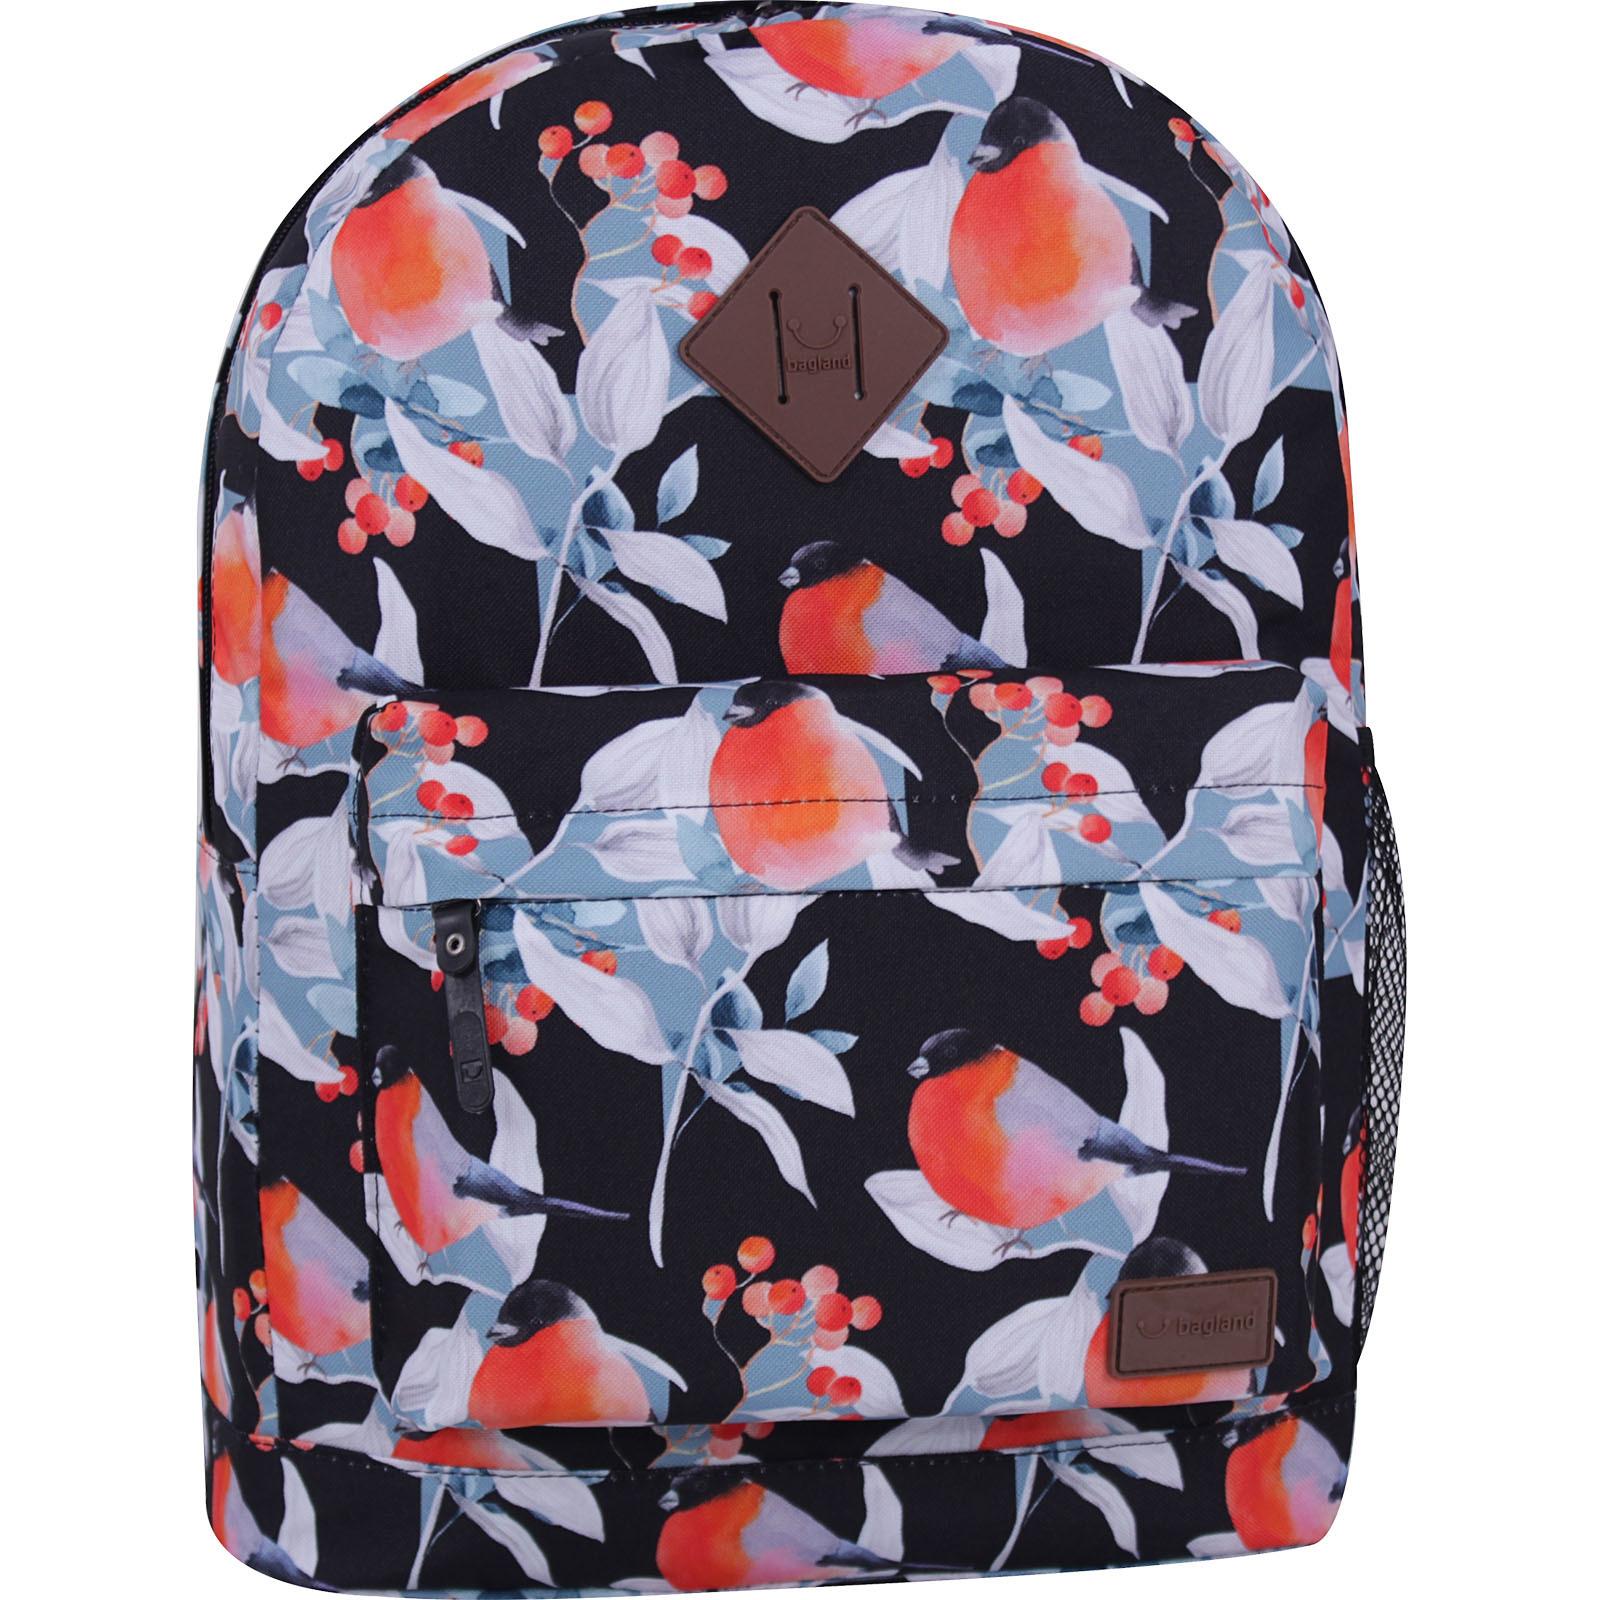 Городские рюкзаки Рюкзак Bagland Молодежный 17 л. сублімація 738 (00533664) IMG_7549_суб738_-1600.jpg